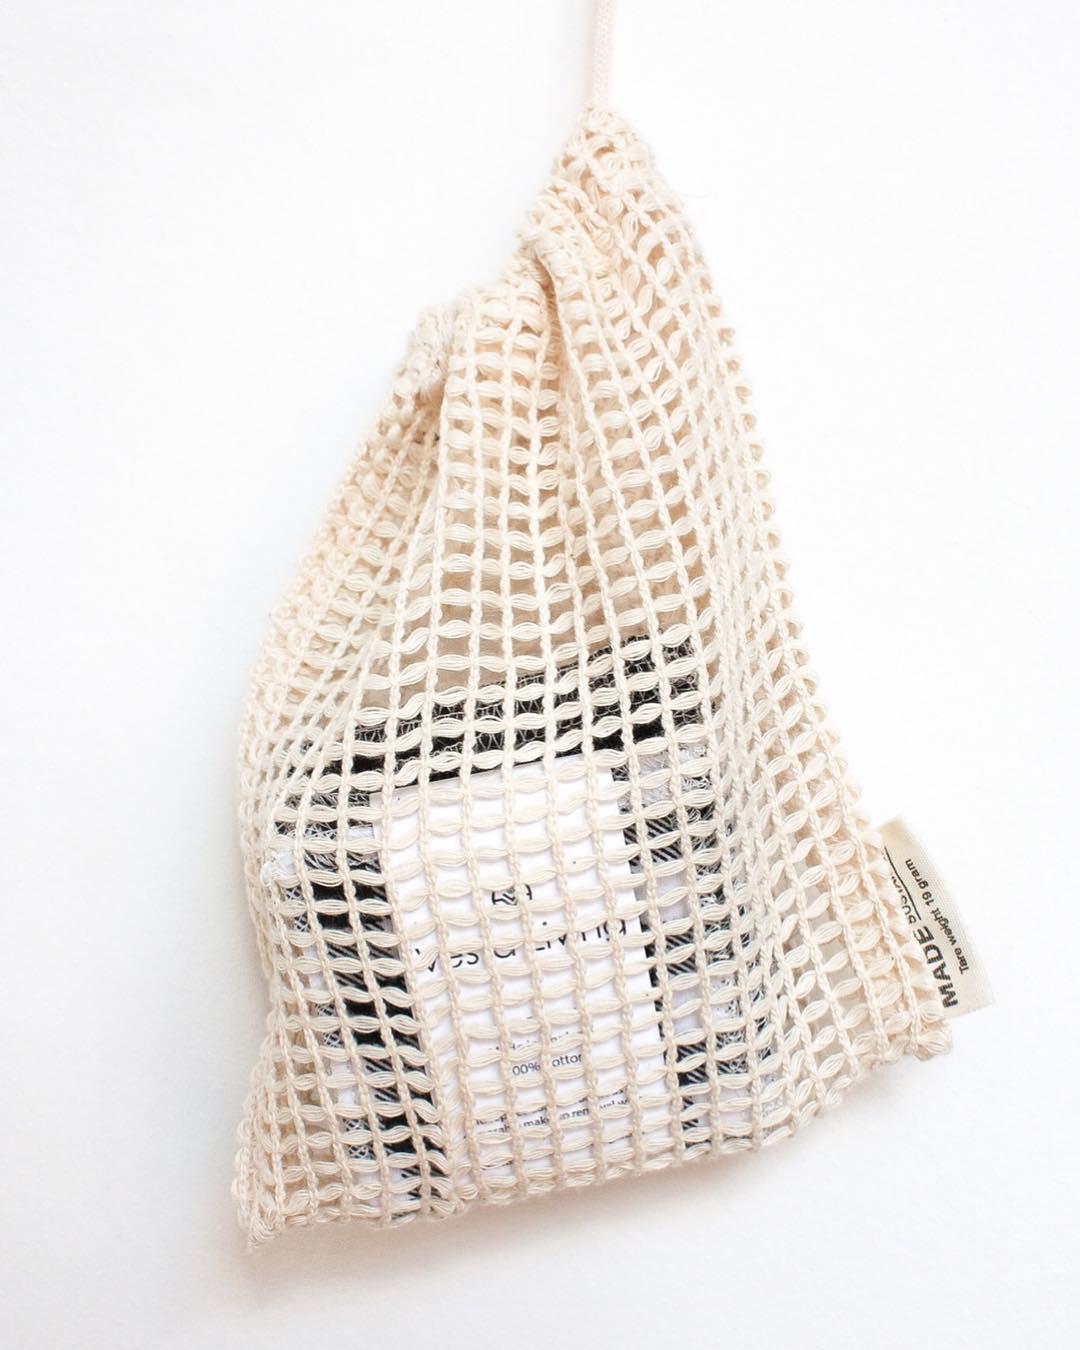 vesta living organic cotton net bags